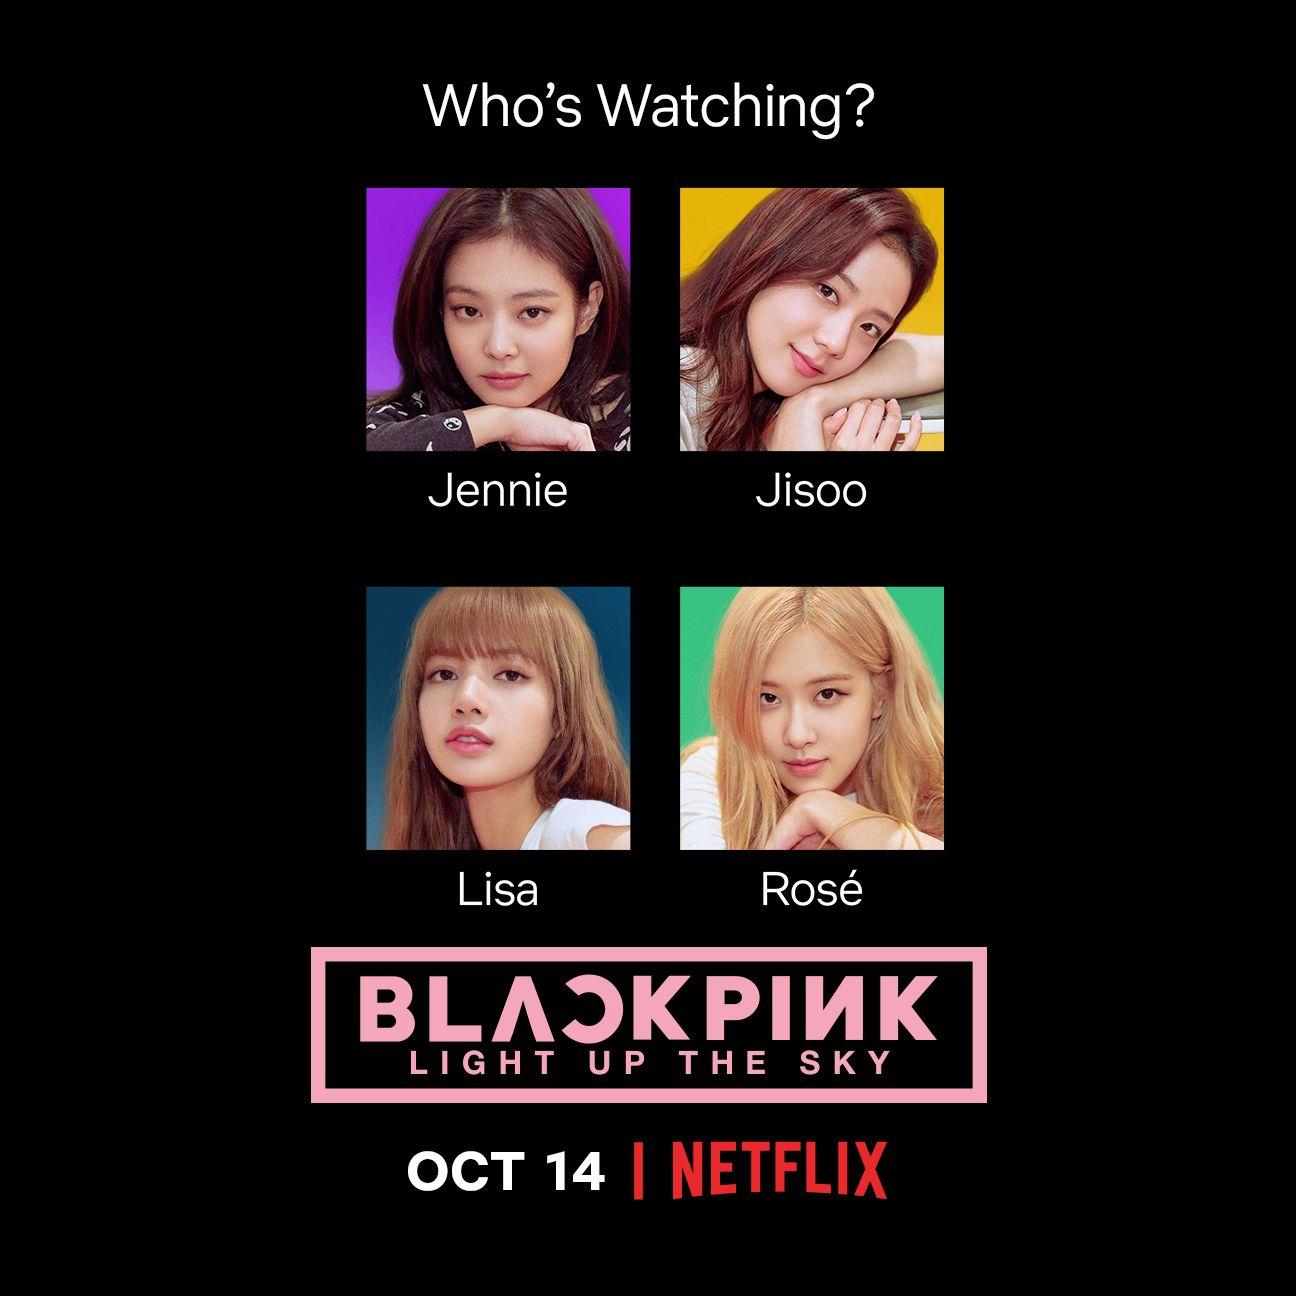 Netflix on Twitter in 2020 Netflix, Blackpink, Netflix